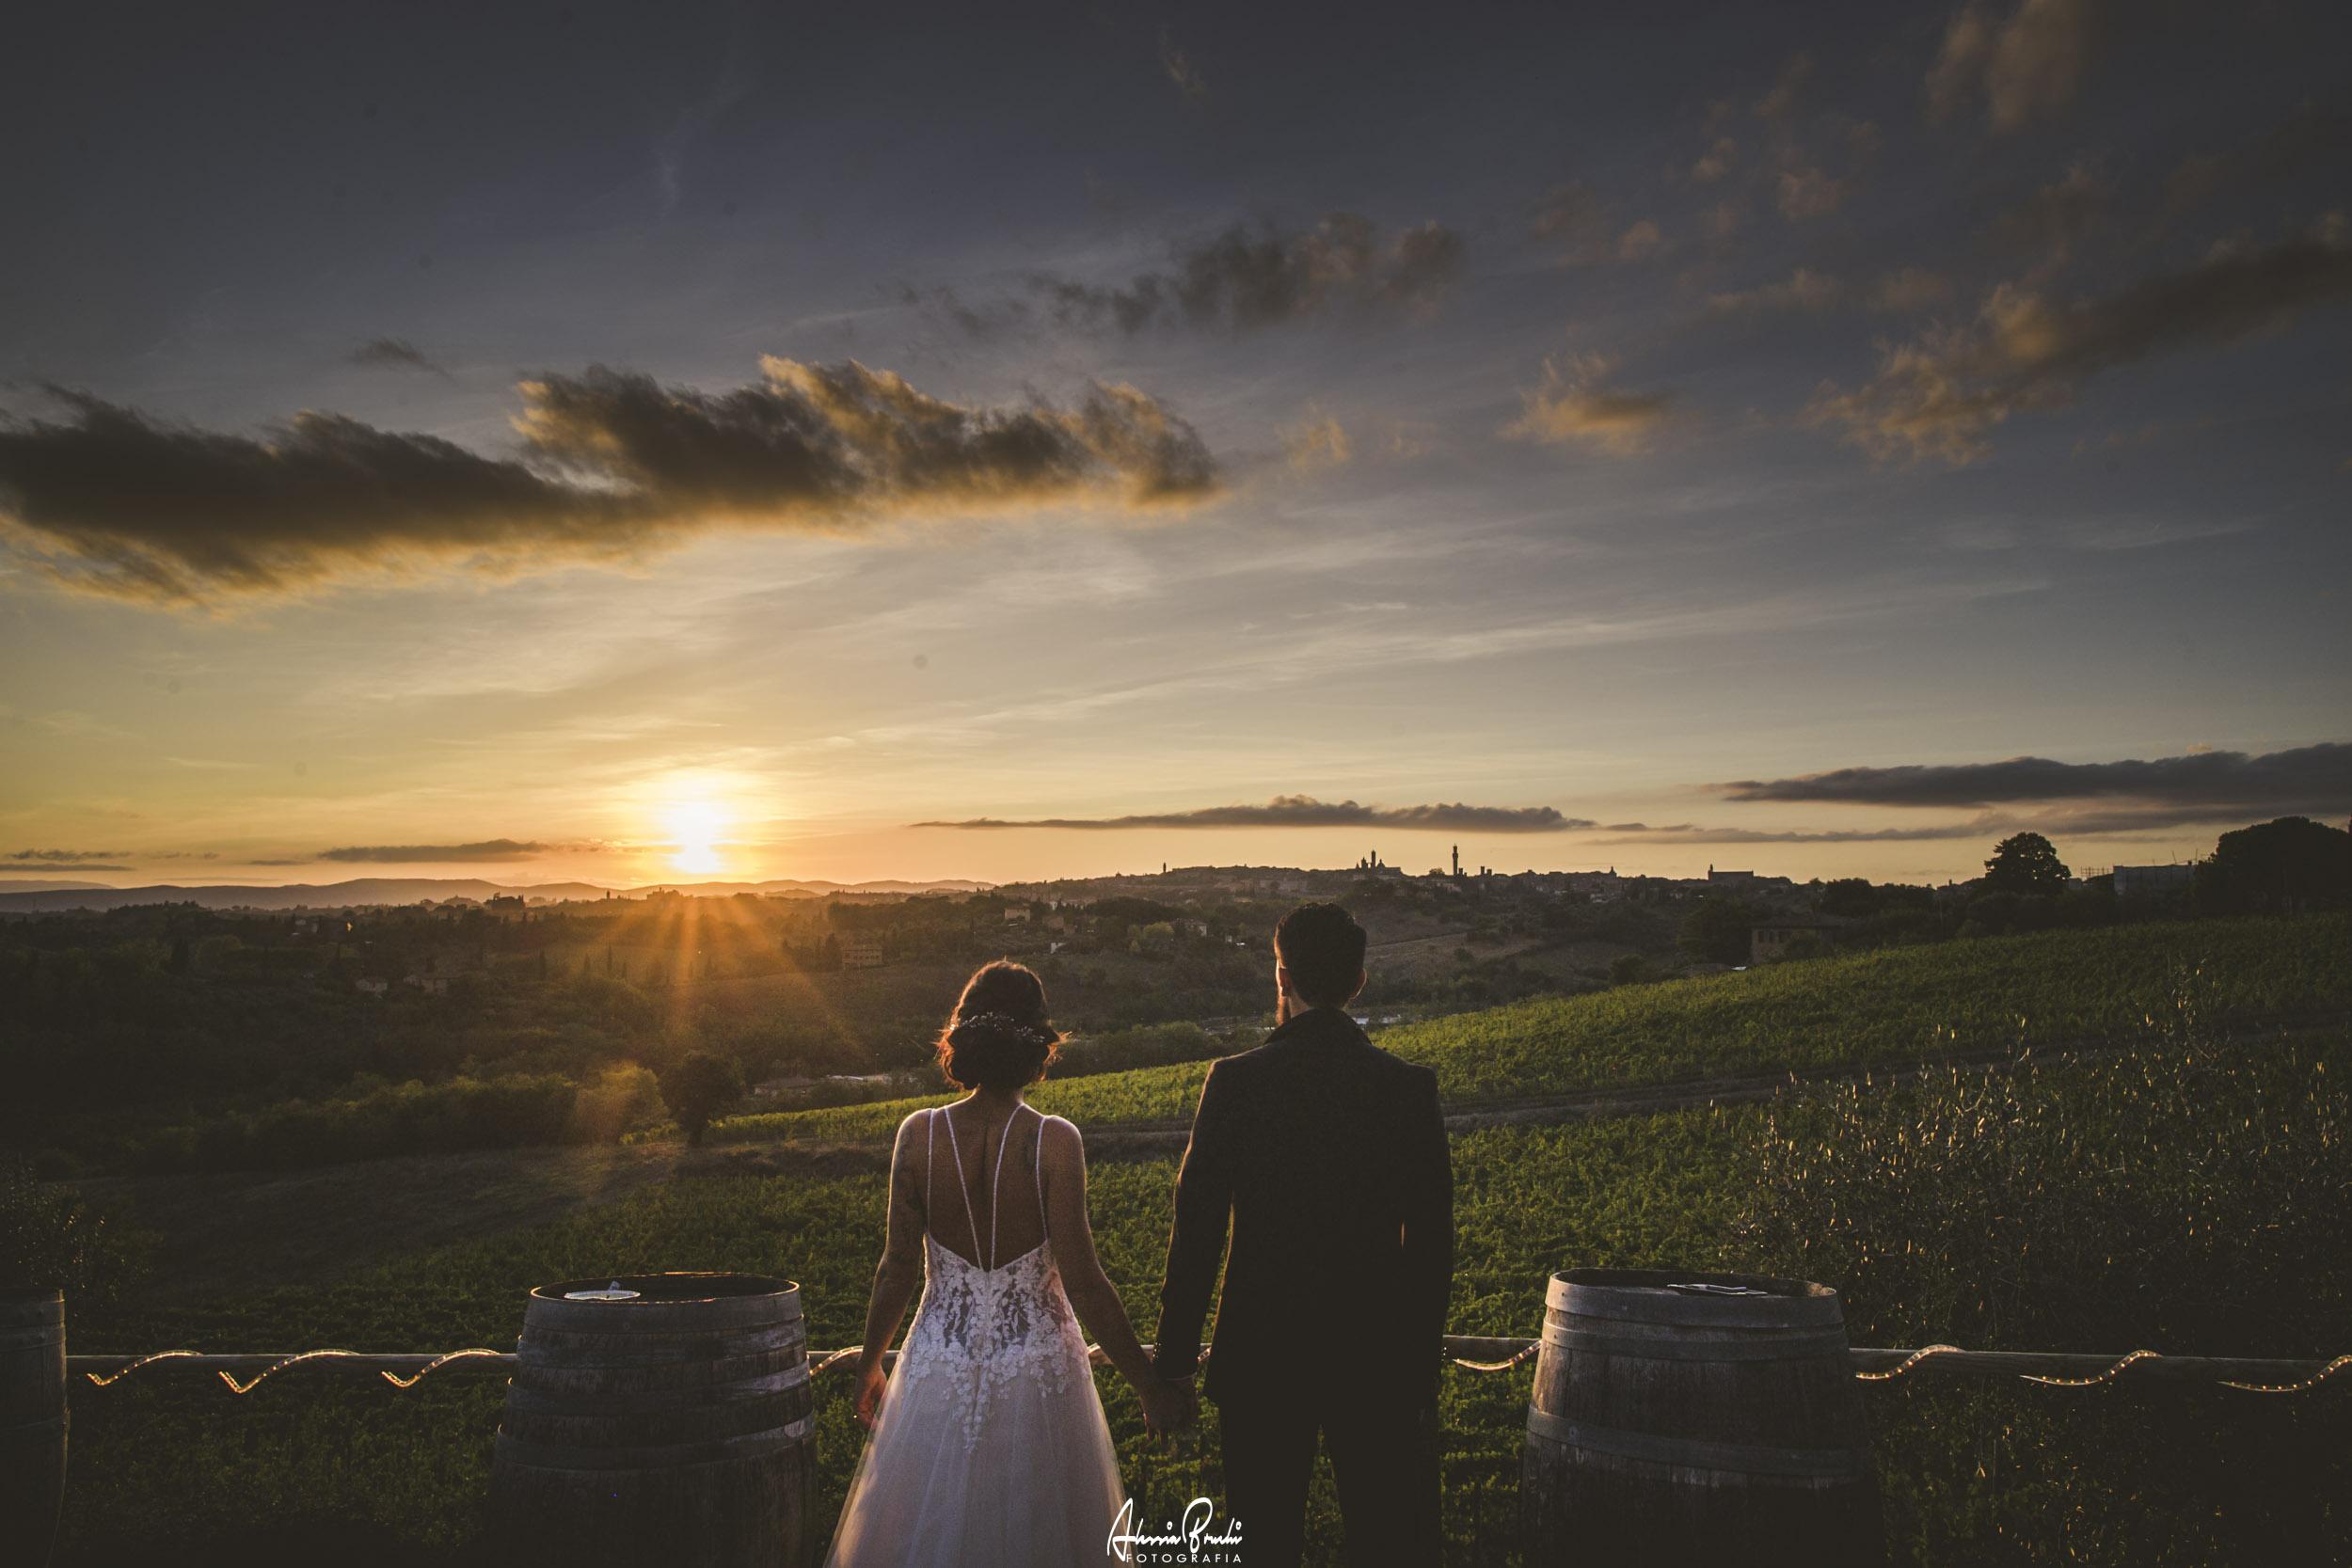 ROMANTIC WEDDING PHOTOSESSION IN CASTEL DI PUGNA TUSCANY